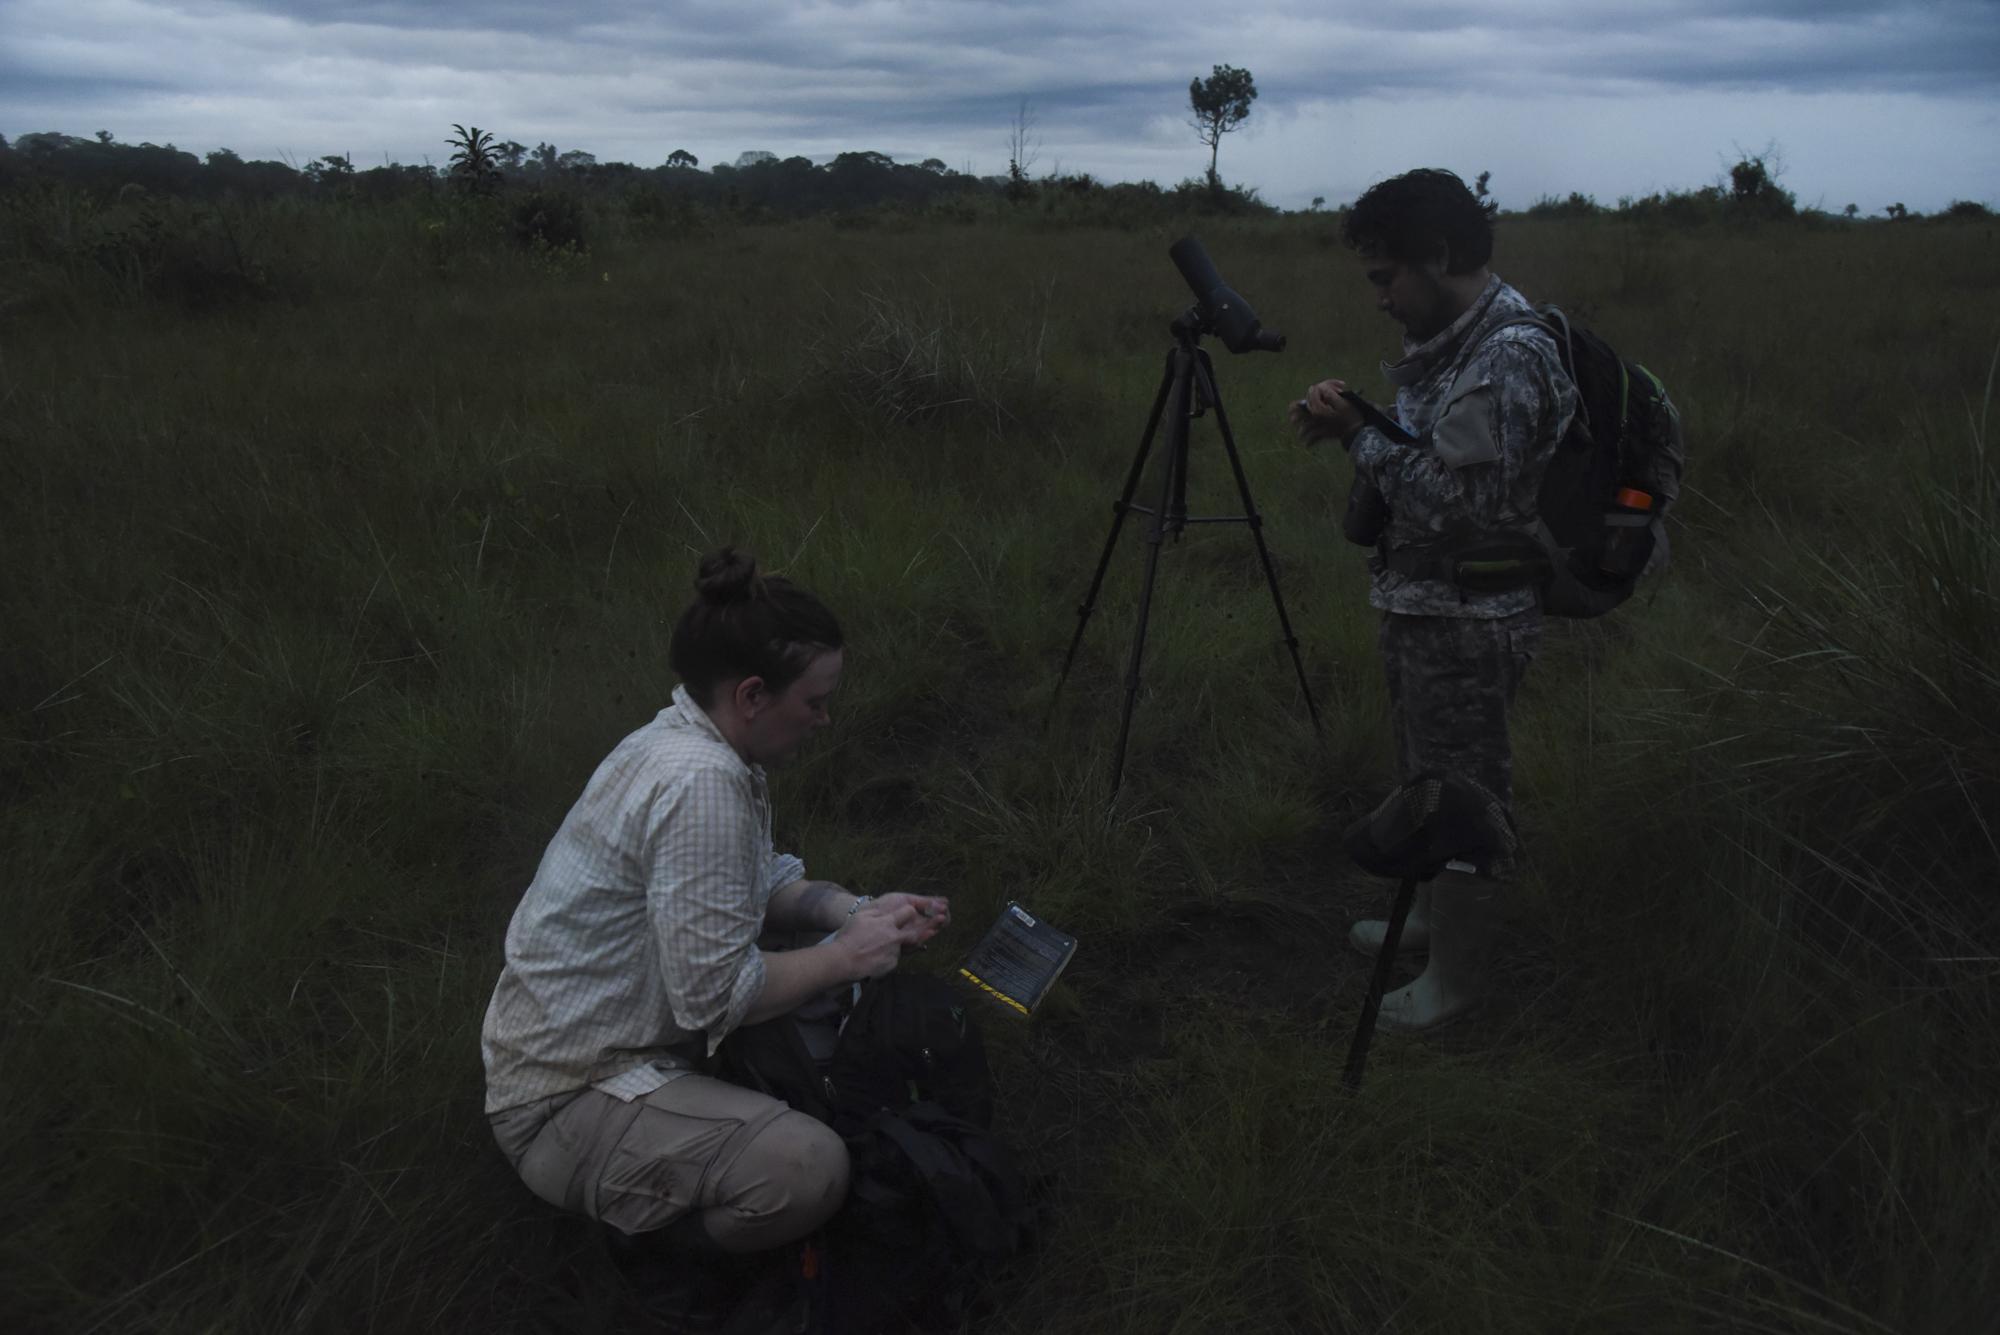 English-Botswana artist Maisie McNecie and Yohamir prepare for begin the bird count as dawn breaks over the Pampas de Heath grassland.